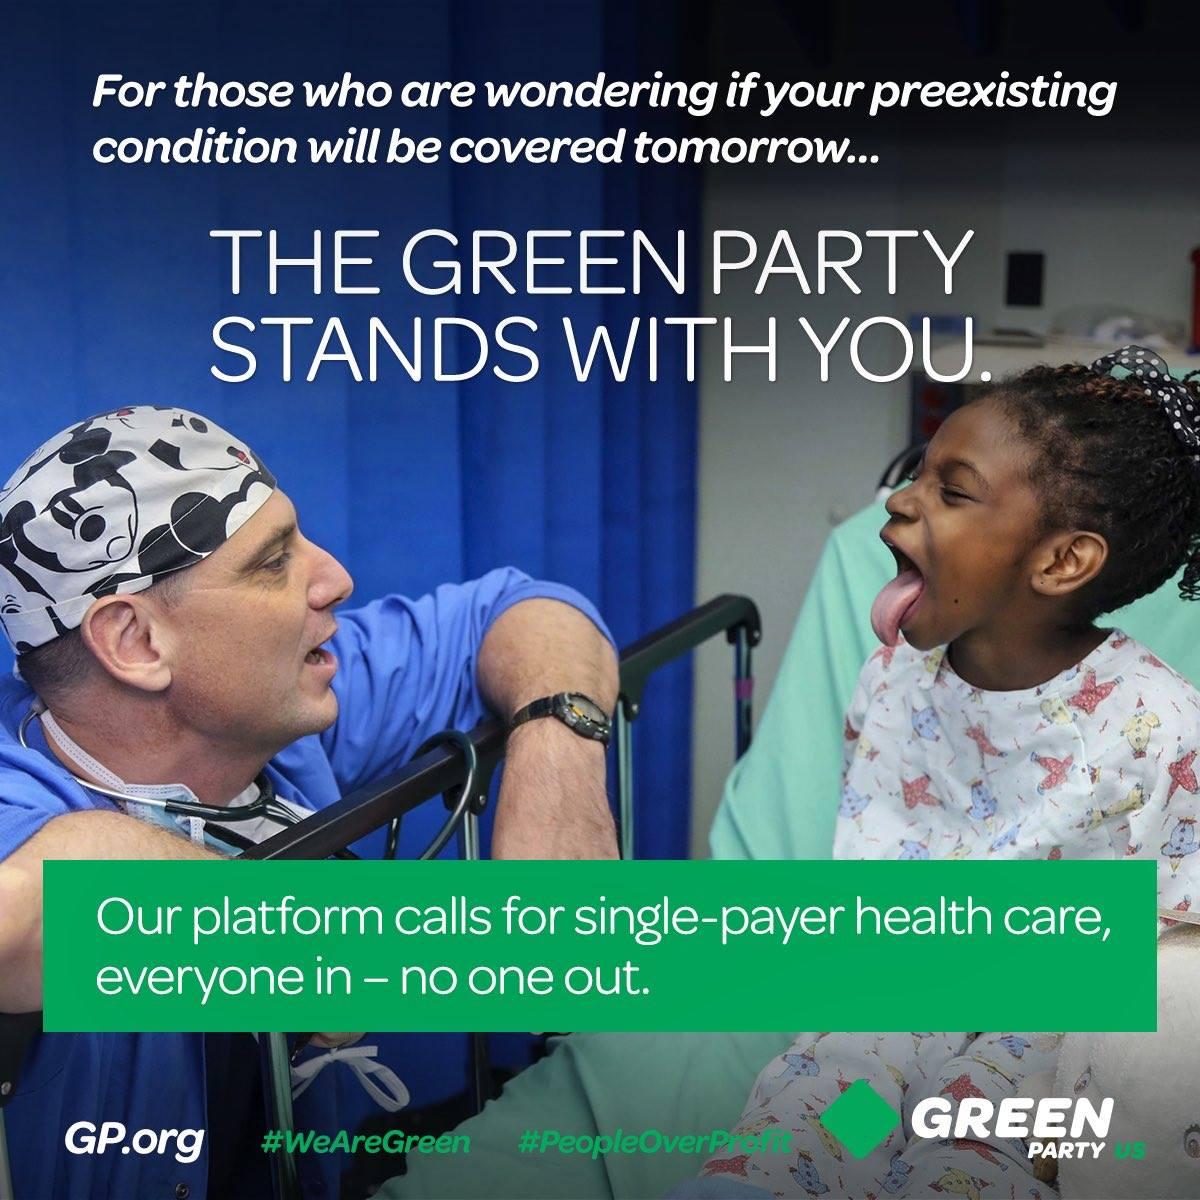 Ventura Green Party (@VtaCAGreens) | Twitter